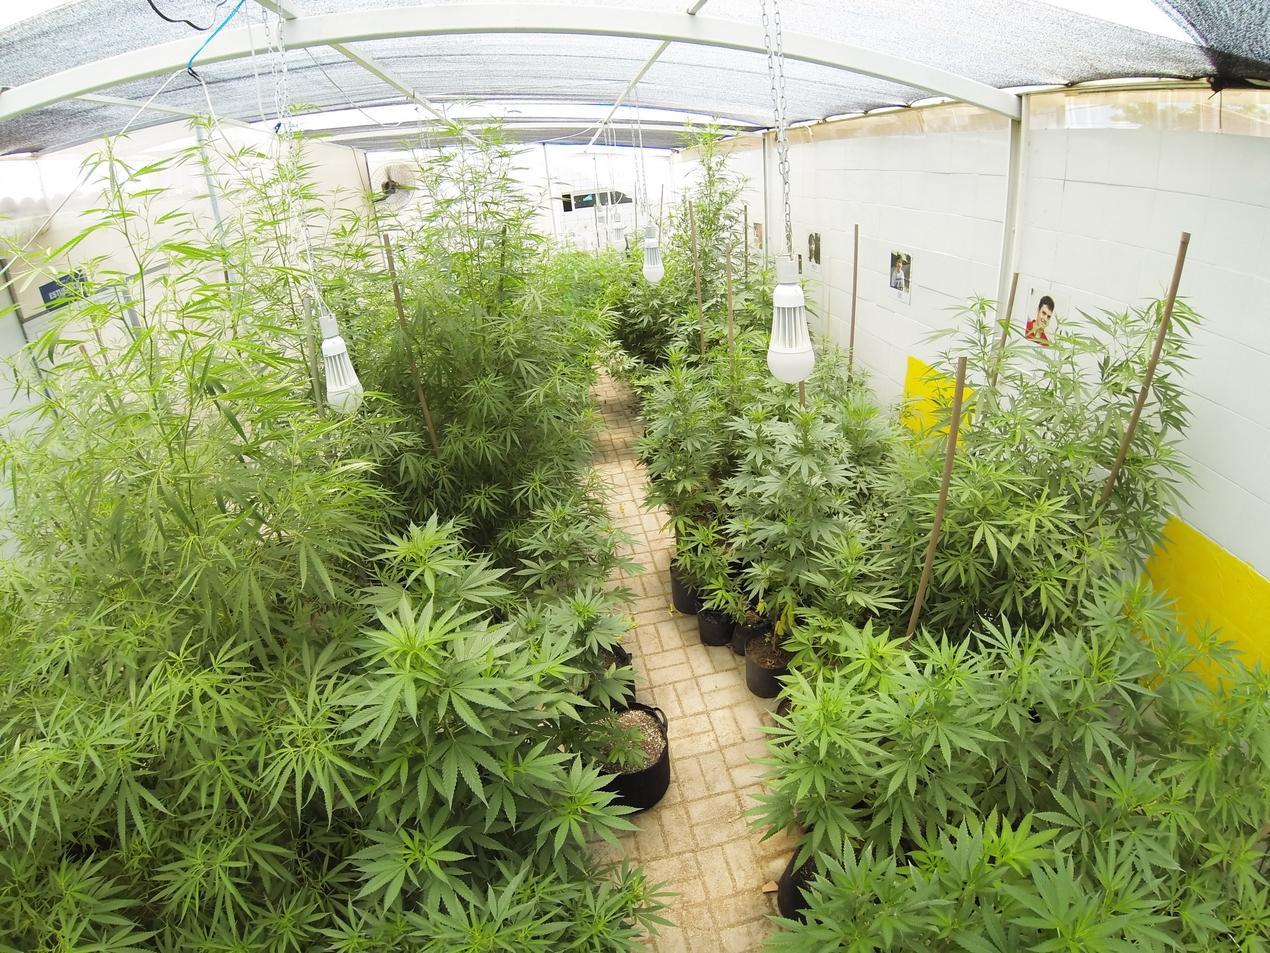 medical marijuana plants growing in Brazil